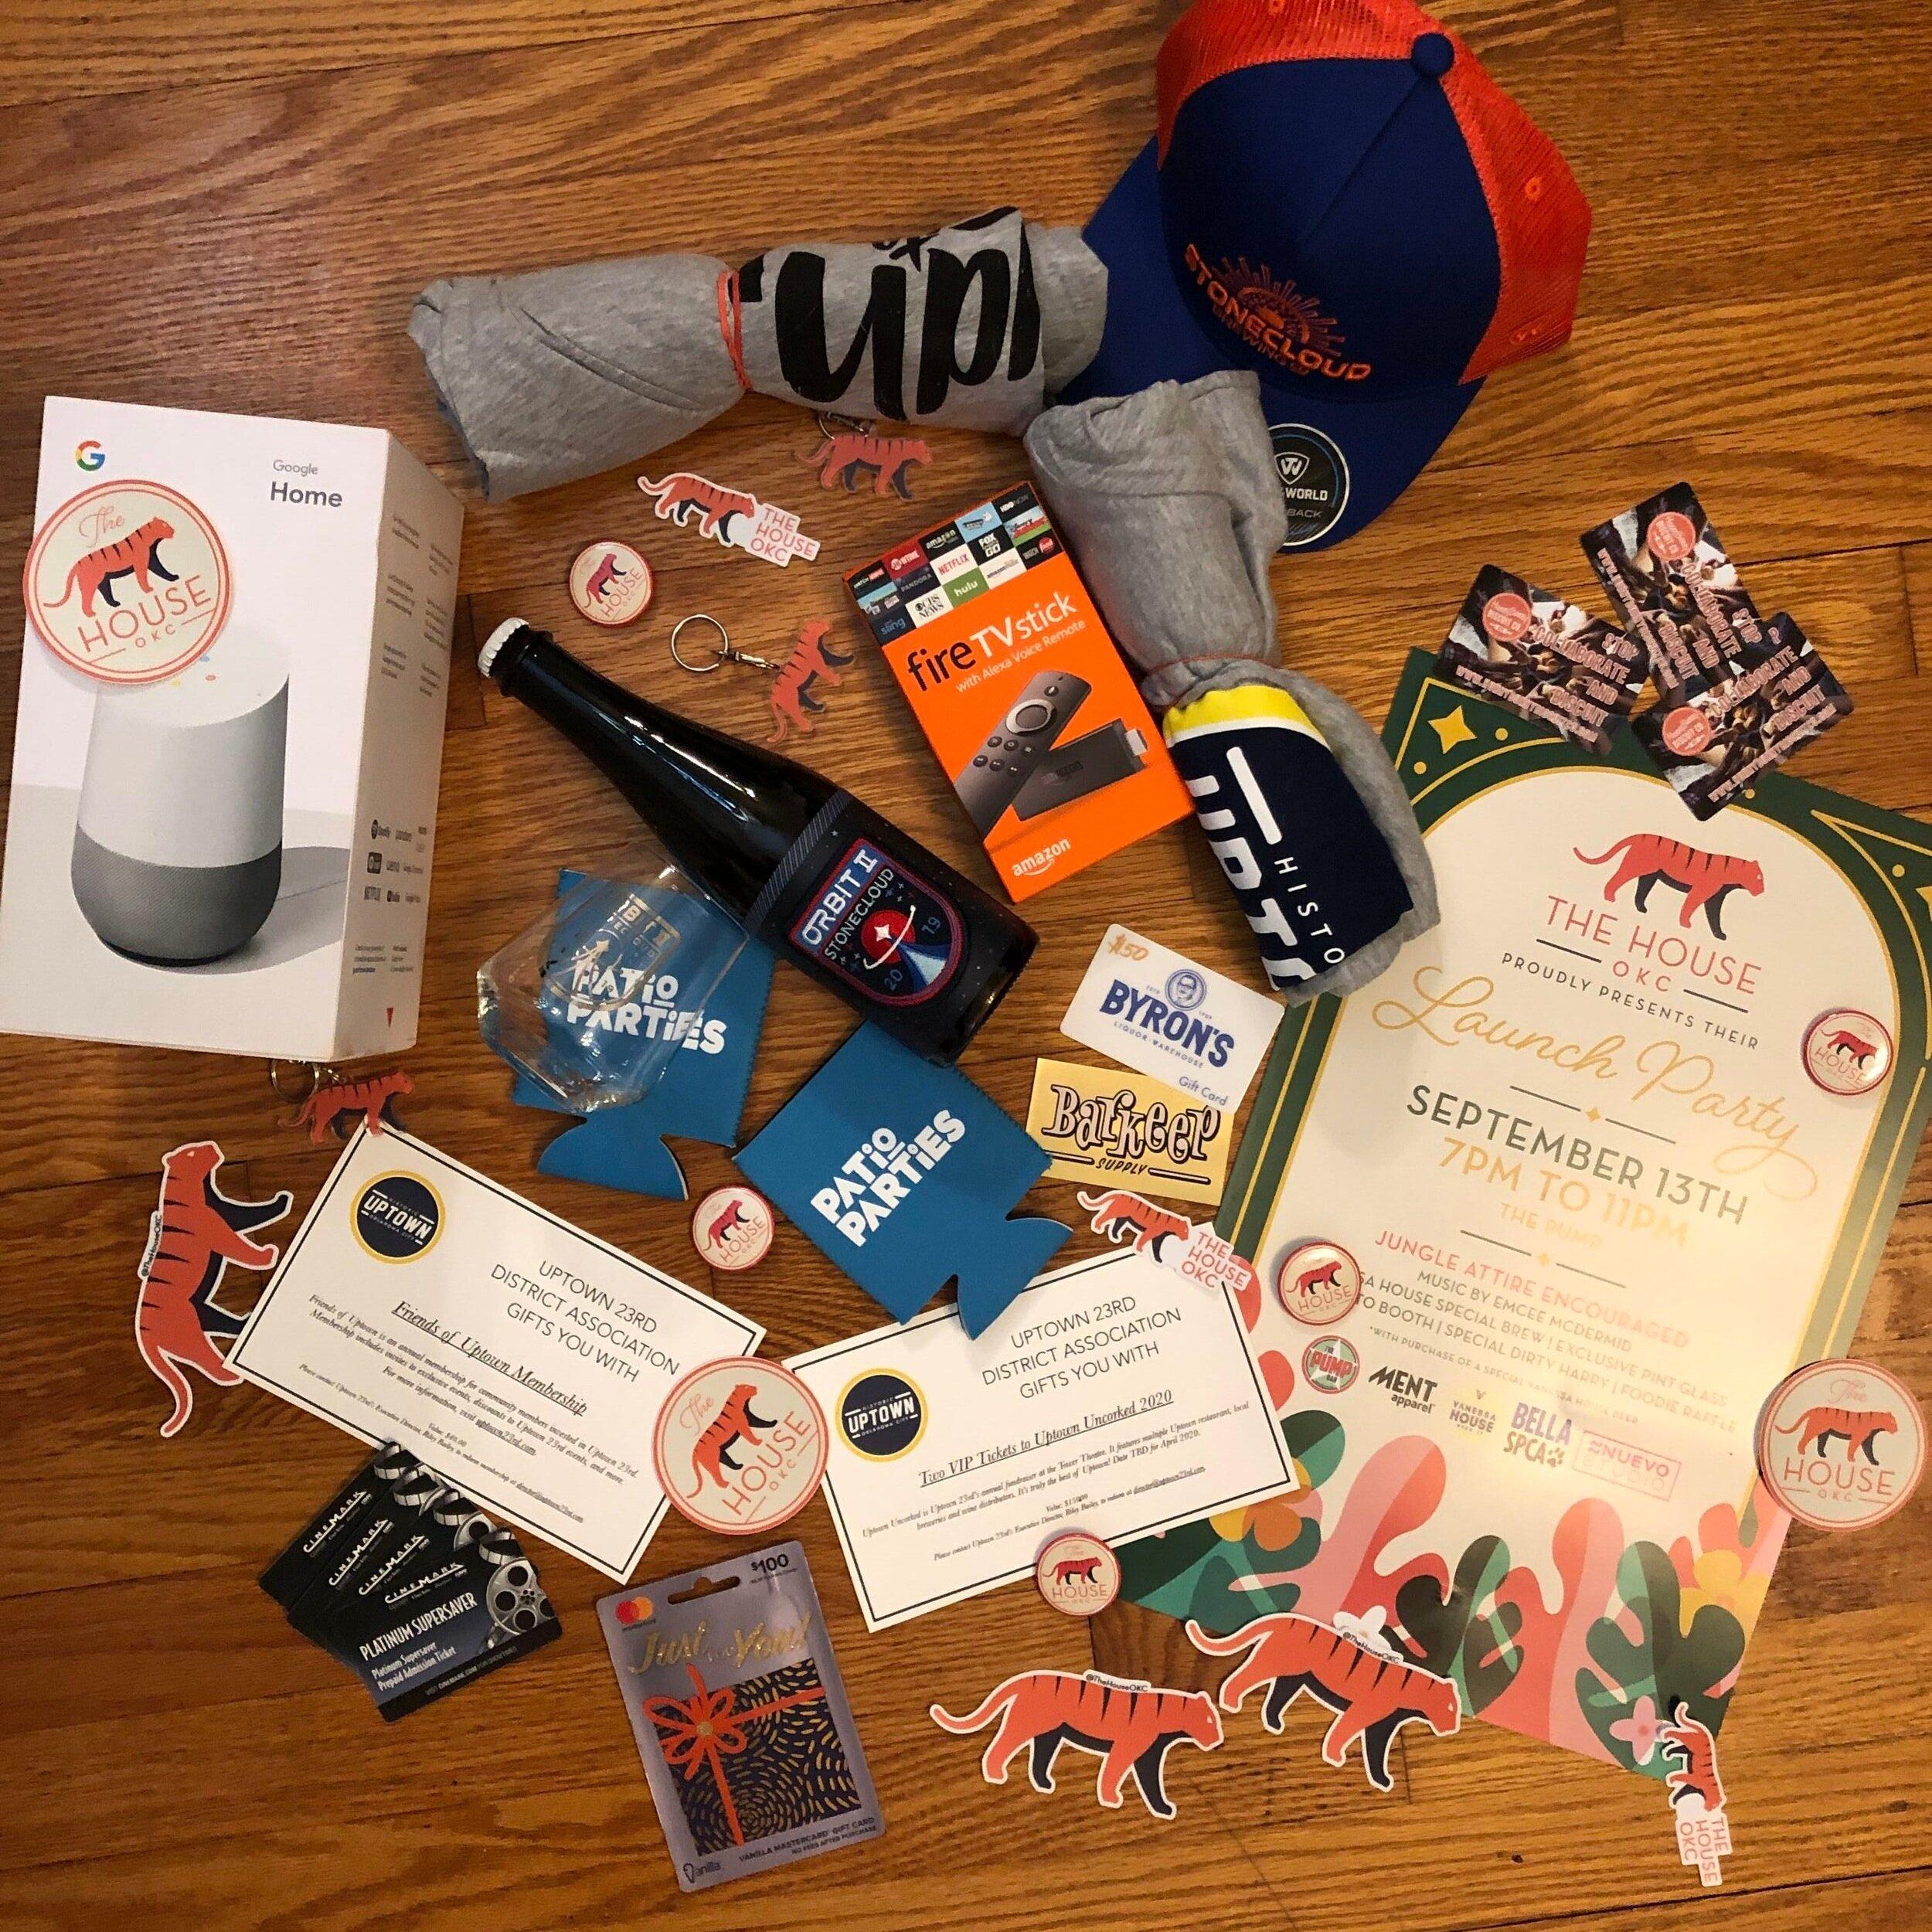 The House OKC Raffle Prizes